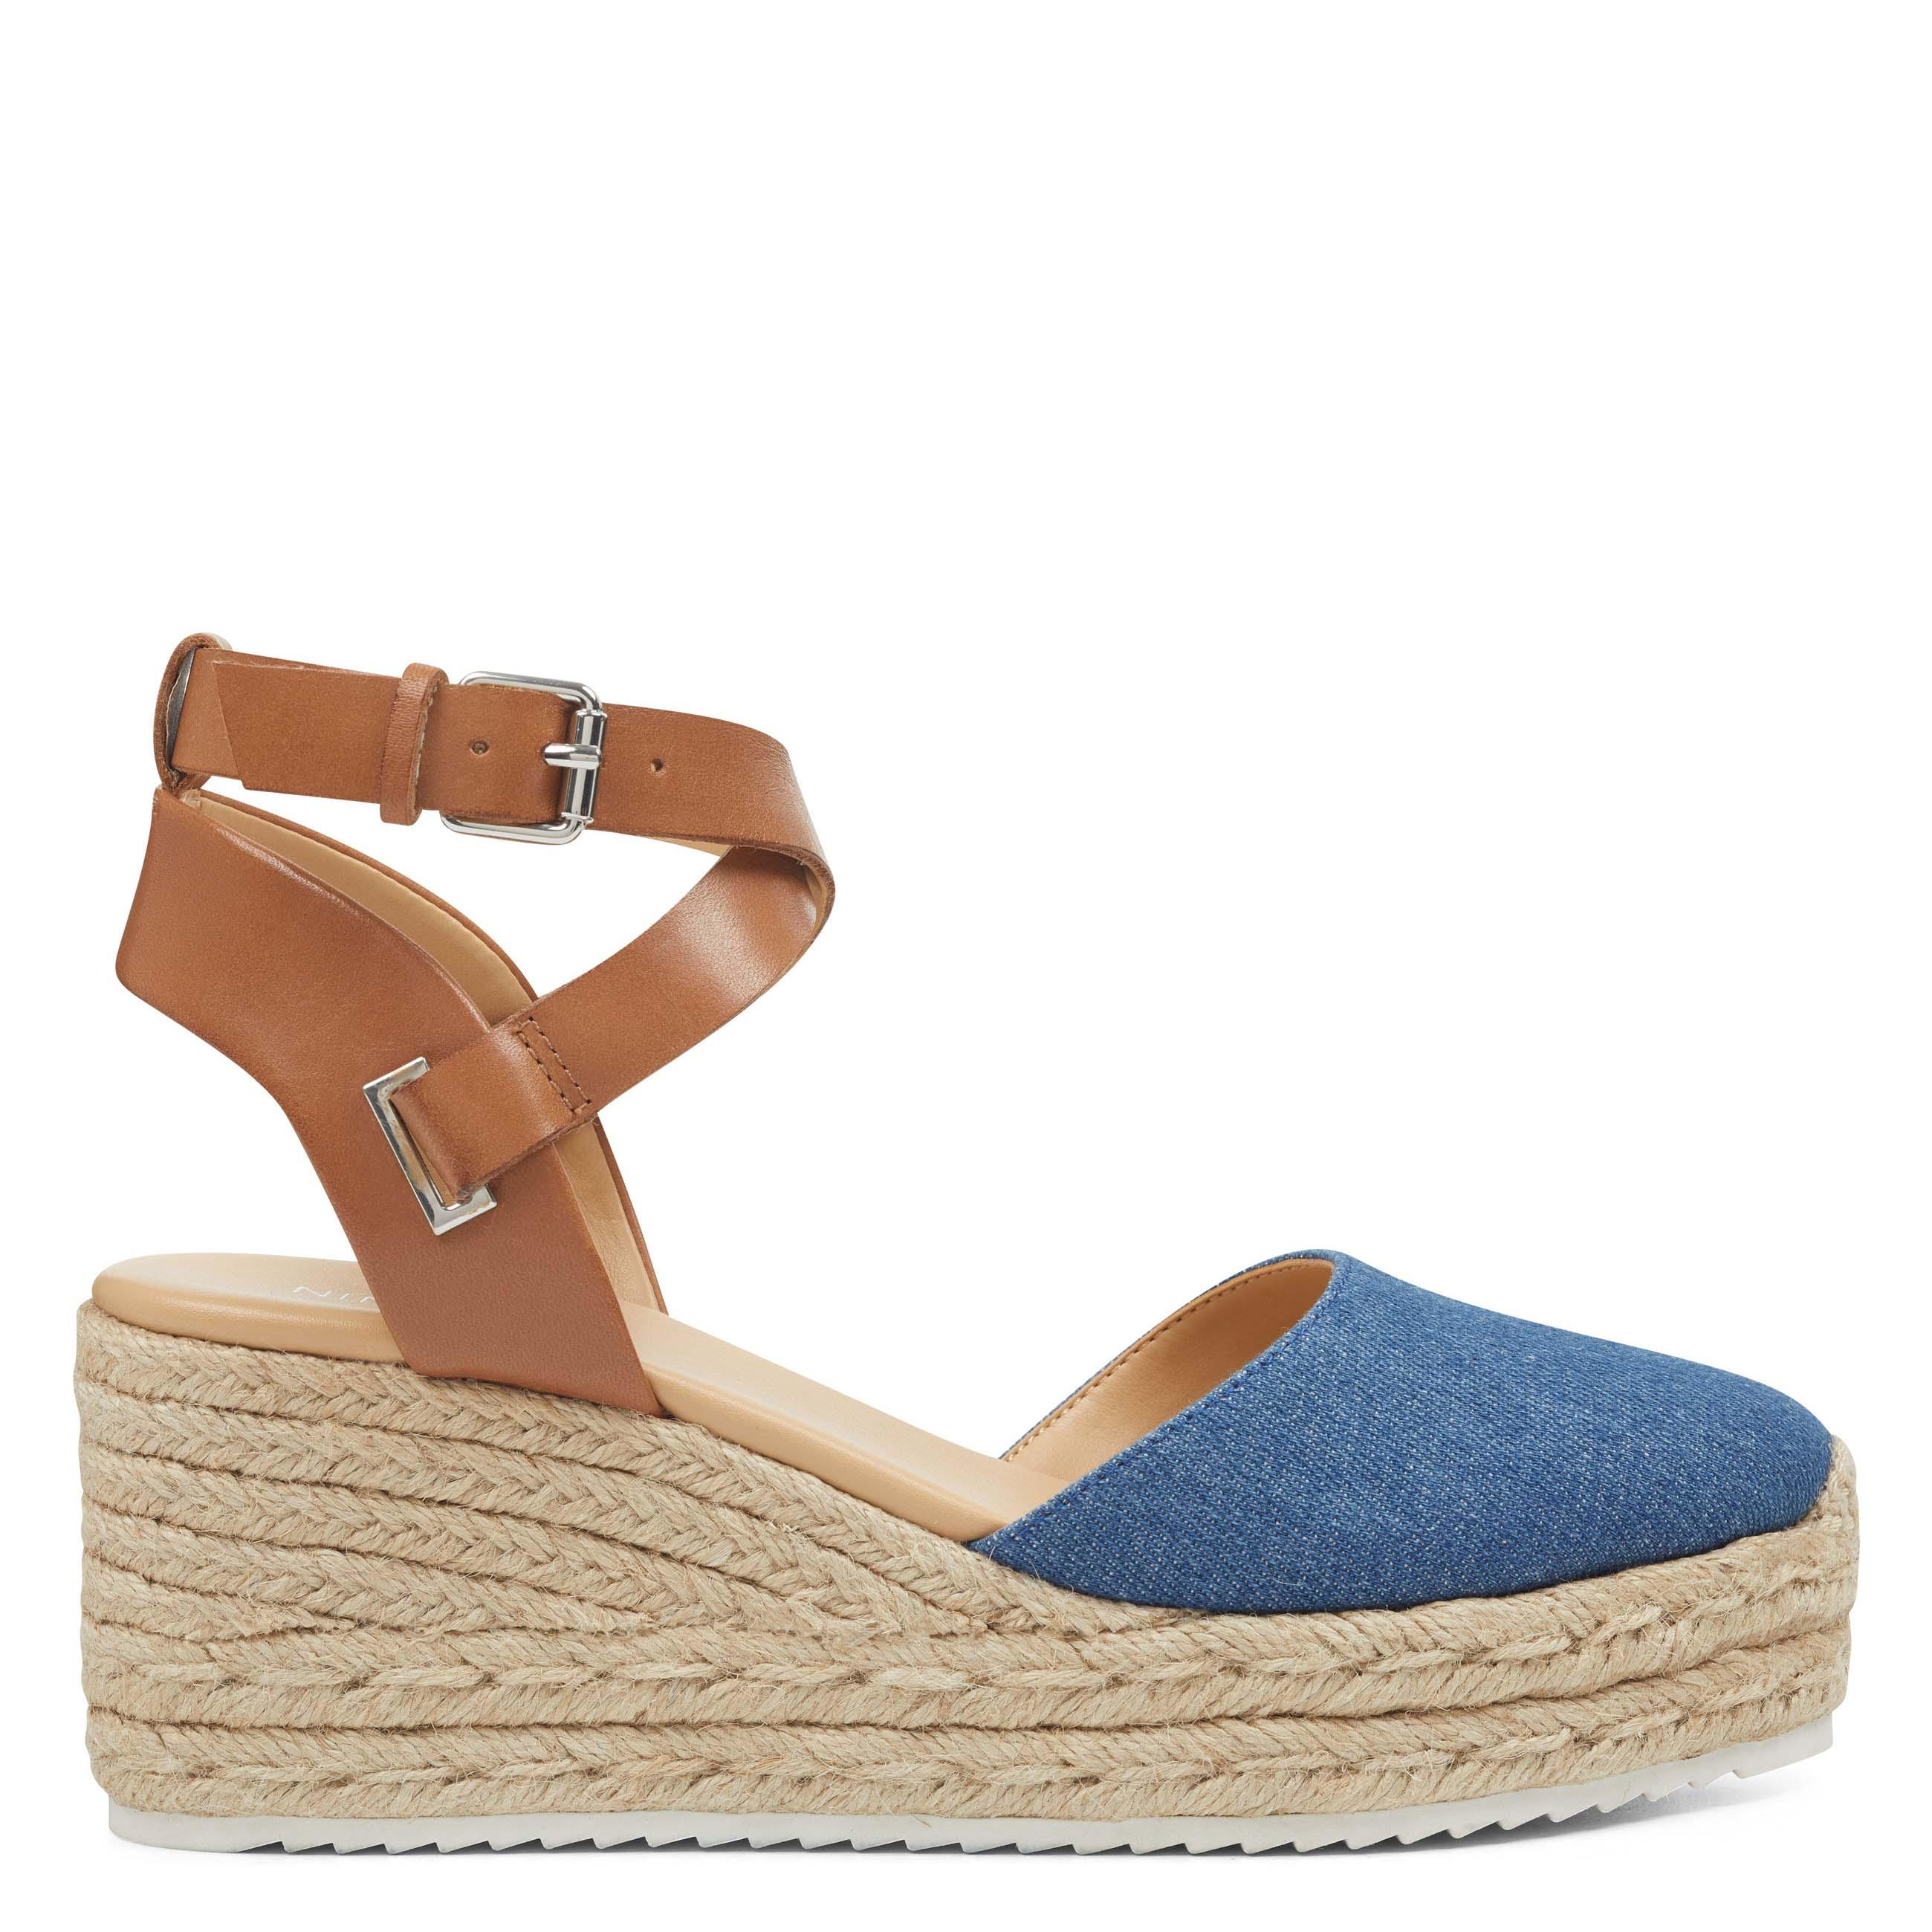 00897c81d455 Lyst - Nine West Ava Espadrille Wedge Sandals in Blue